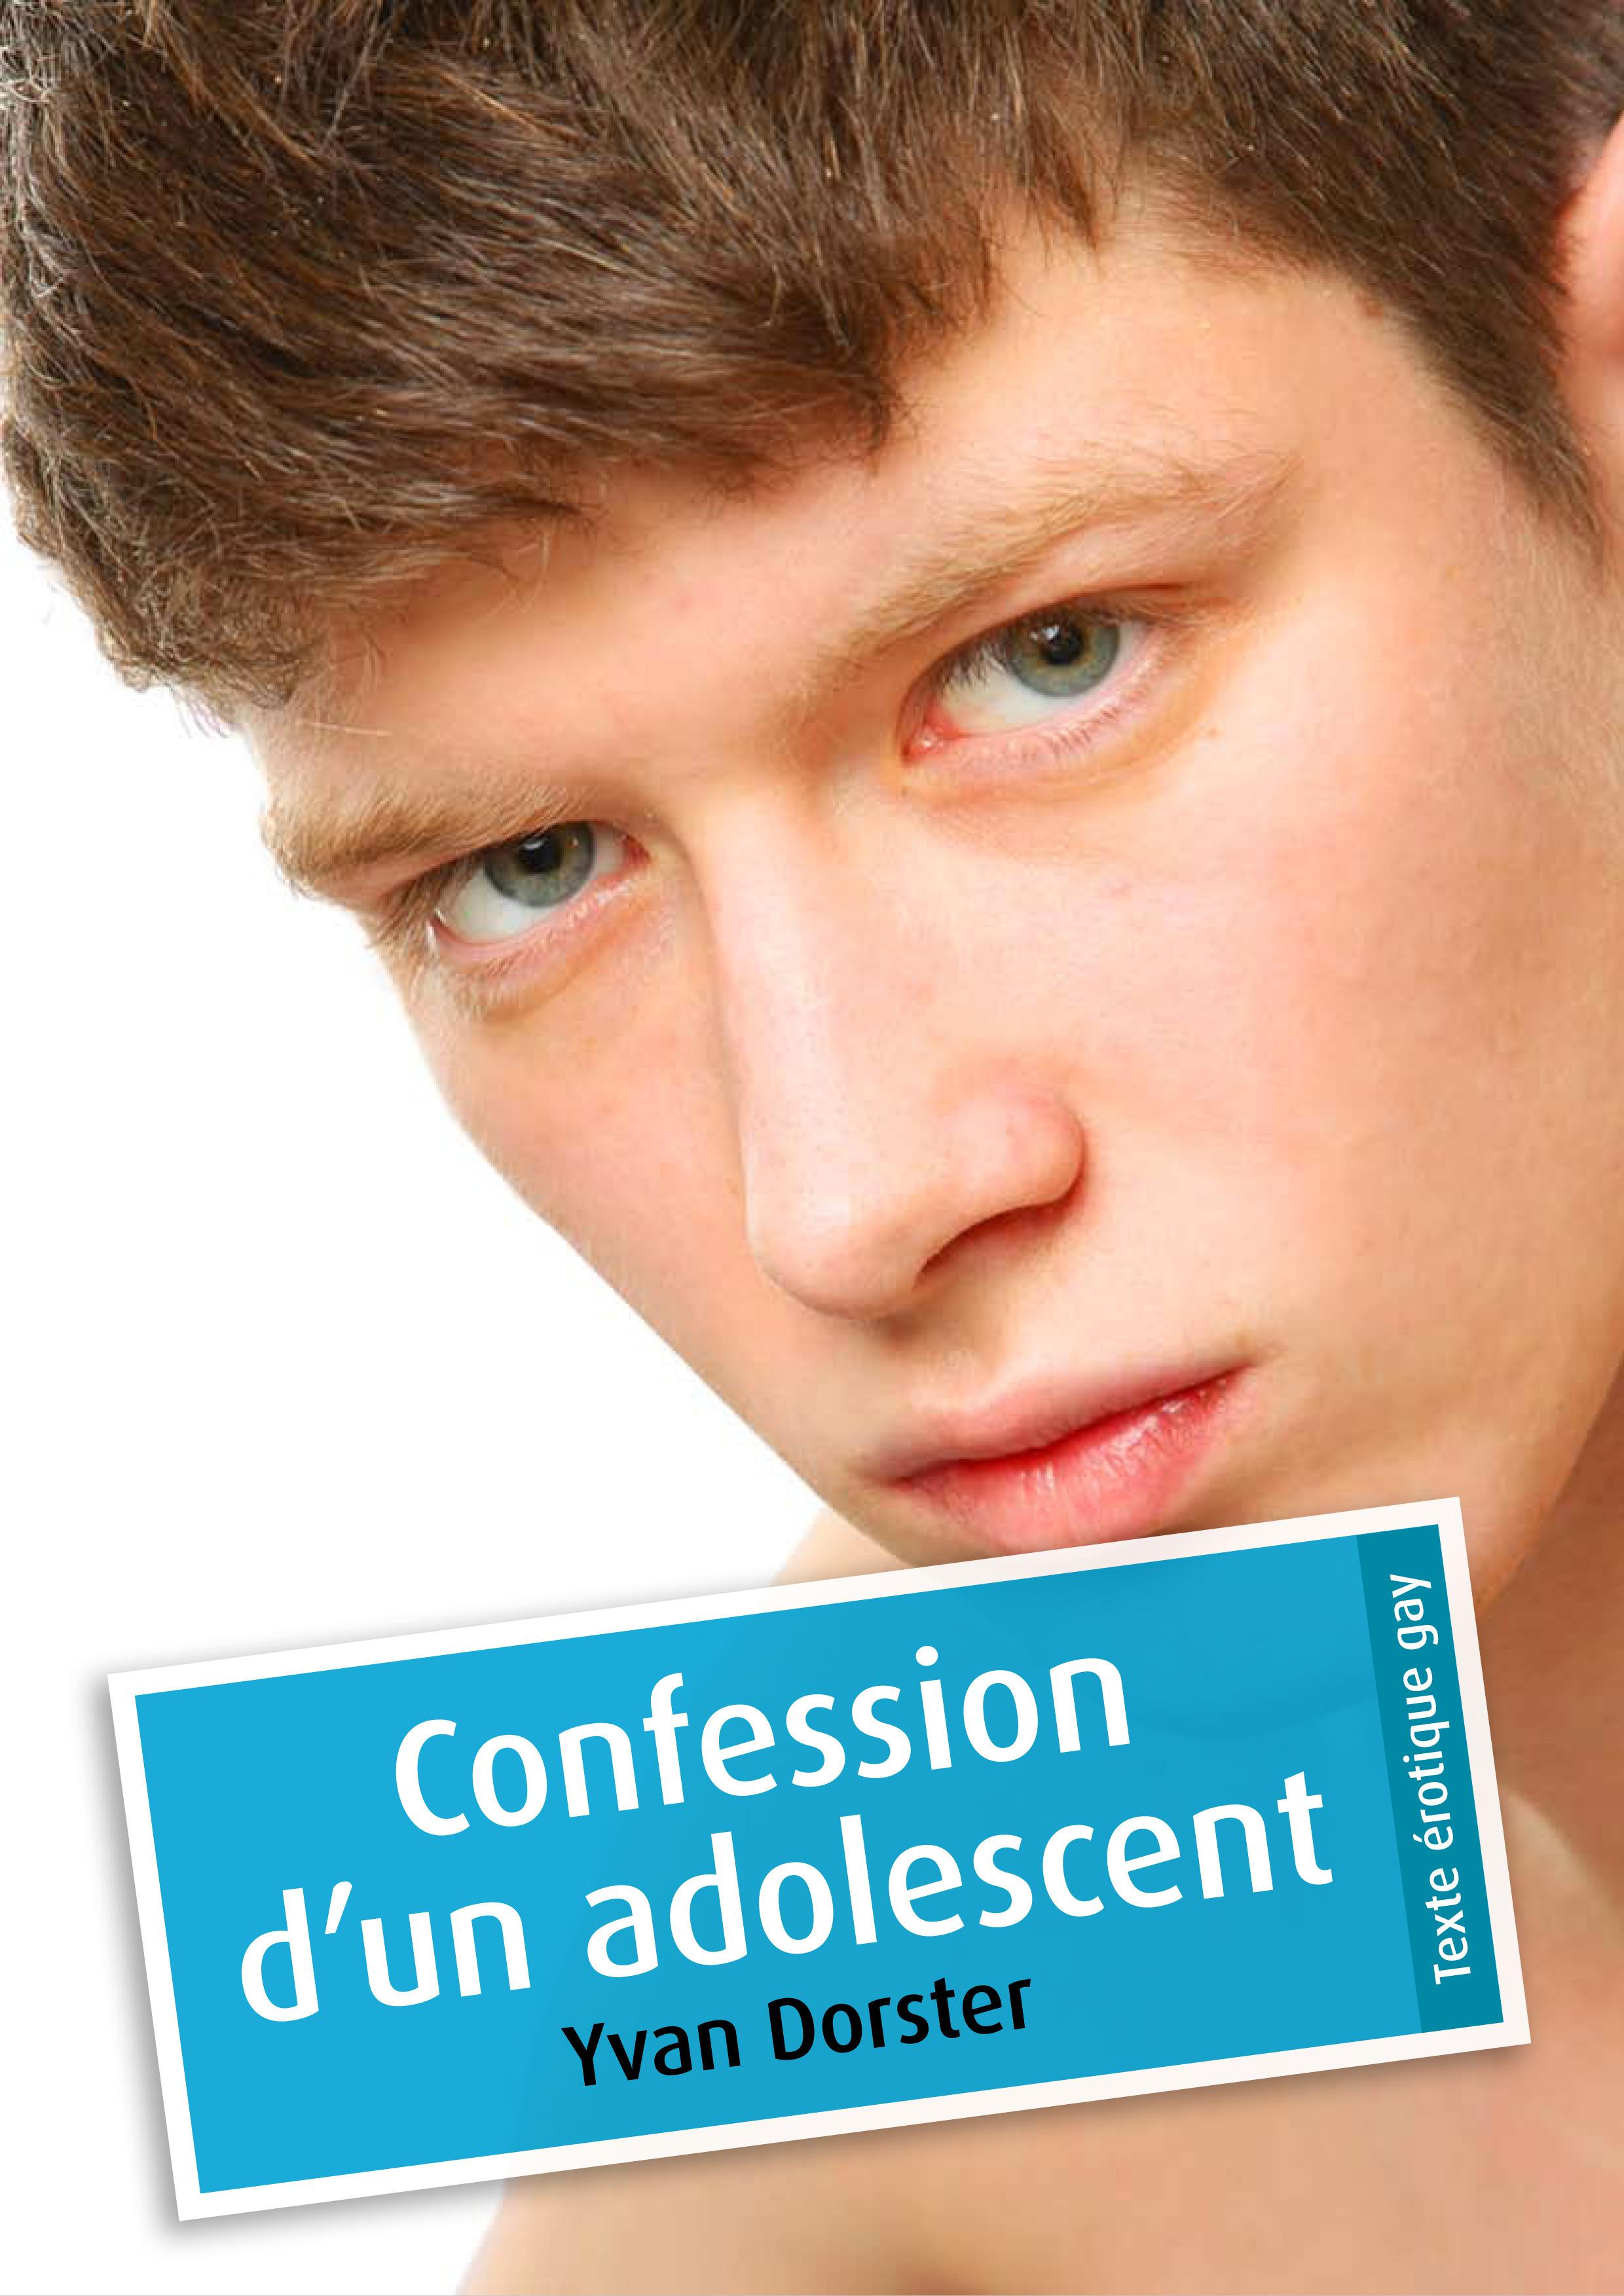 Confession d'un adolescent (érotique gay)